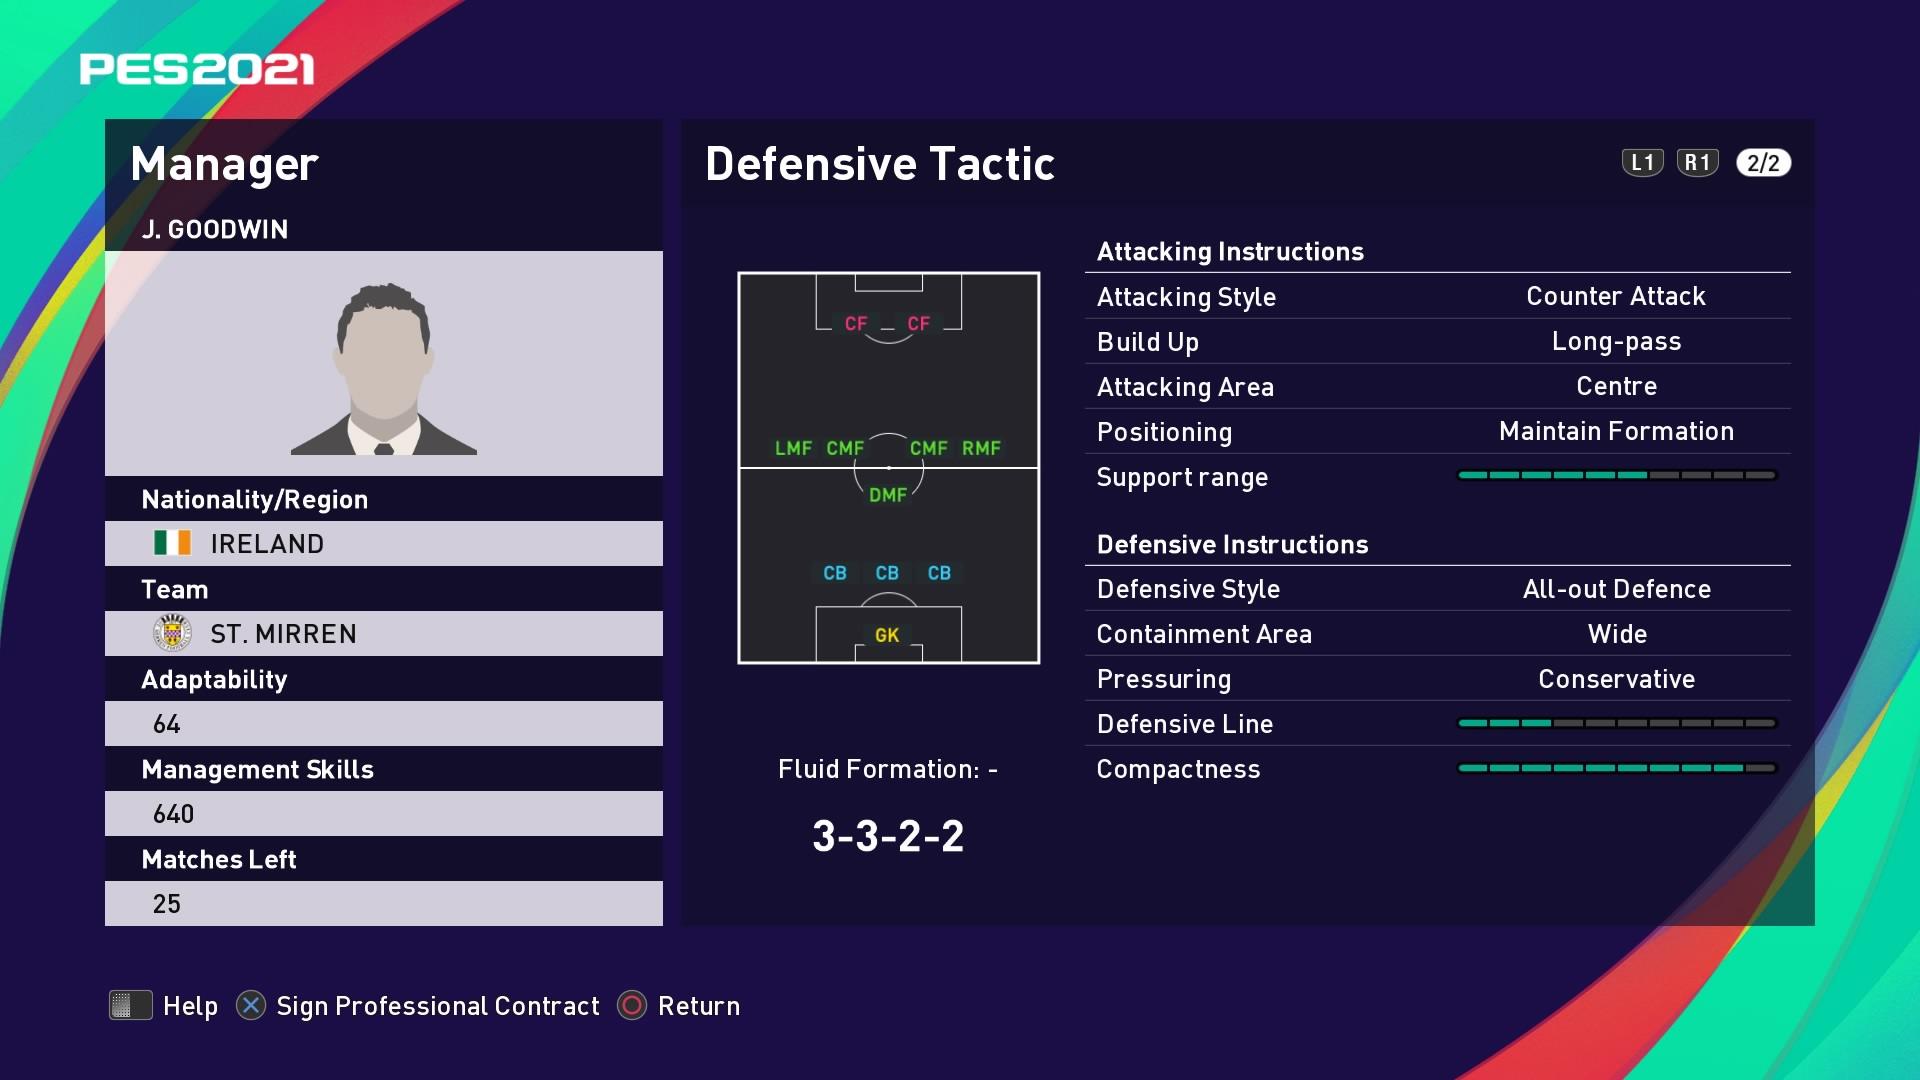 J. Goodwin (Jim Goodwin) Defensive Tactic in PES 2021 myClub